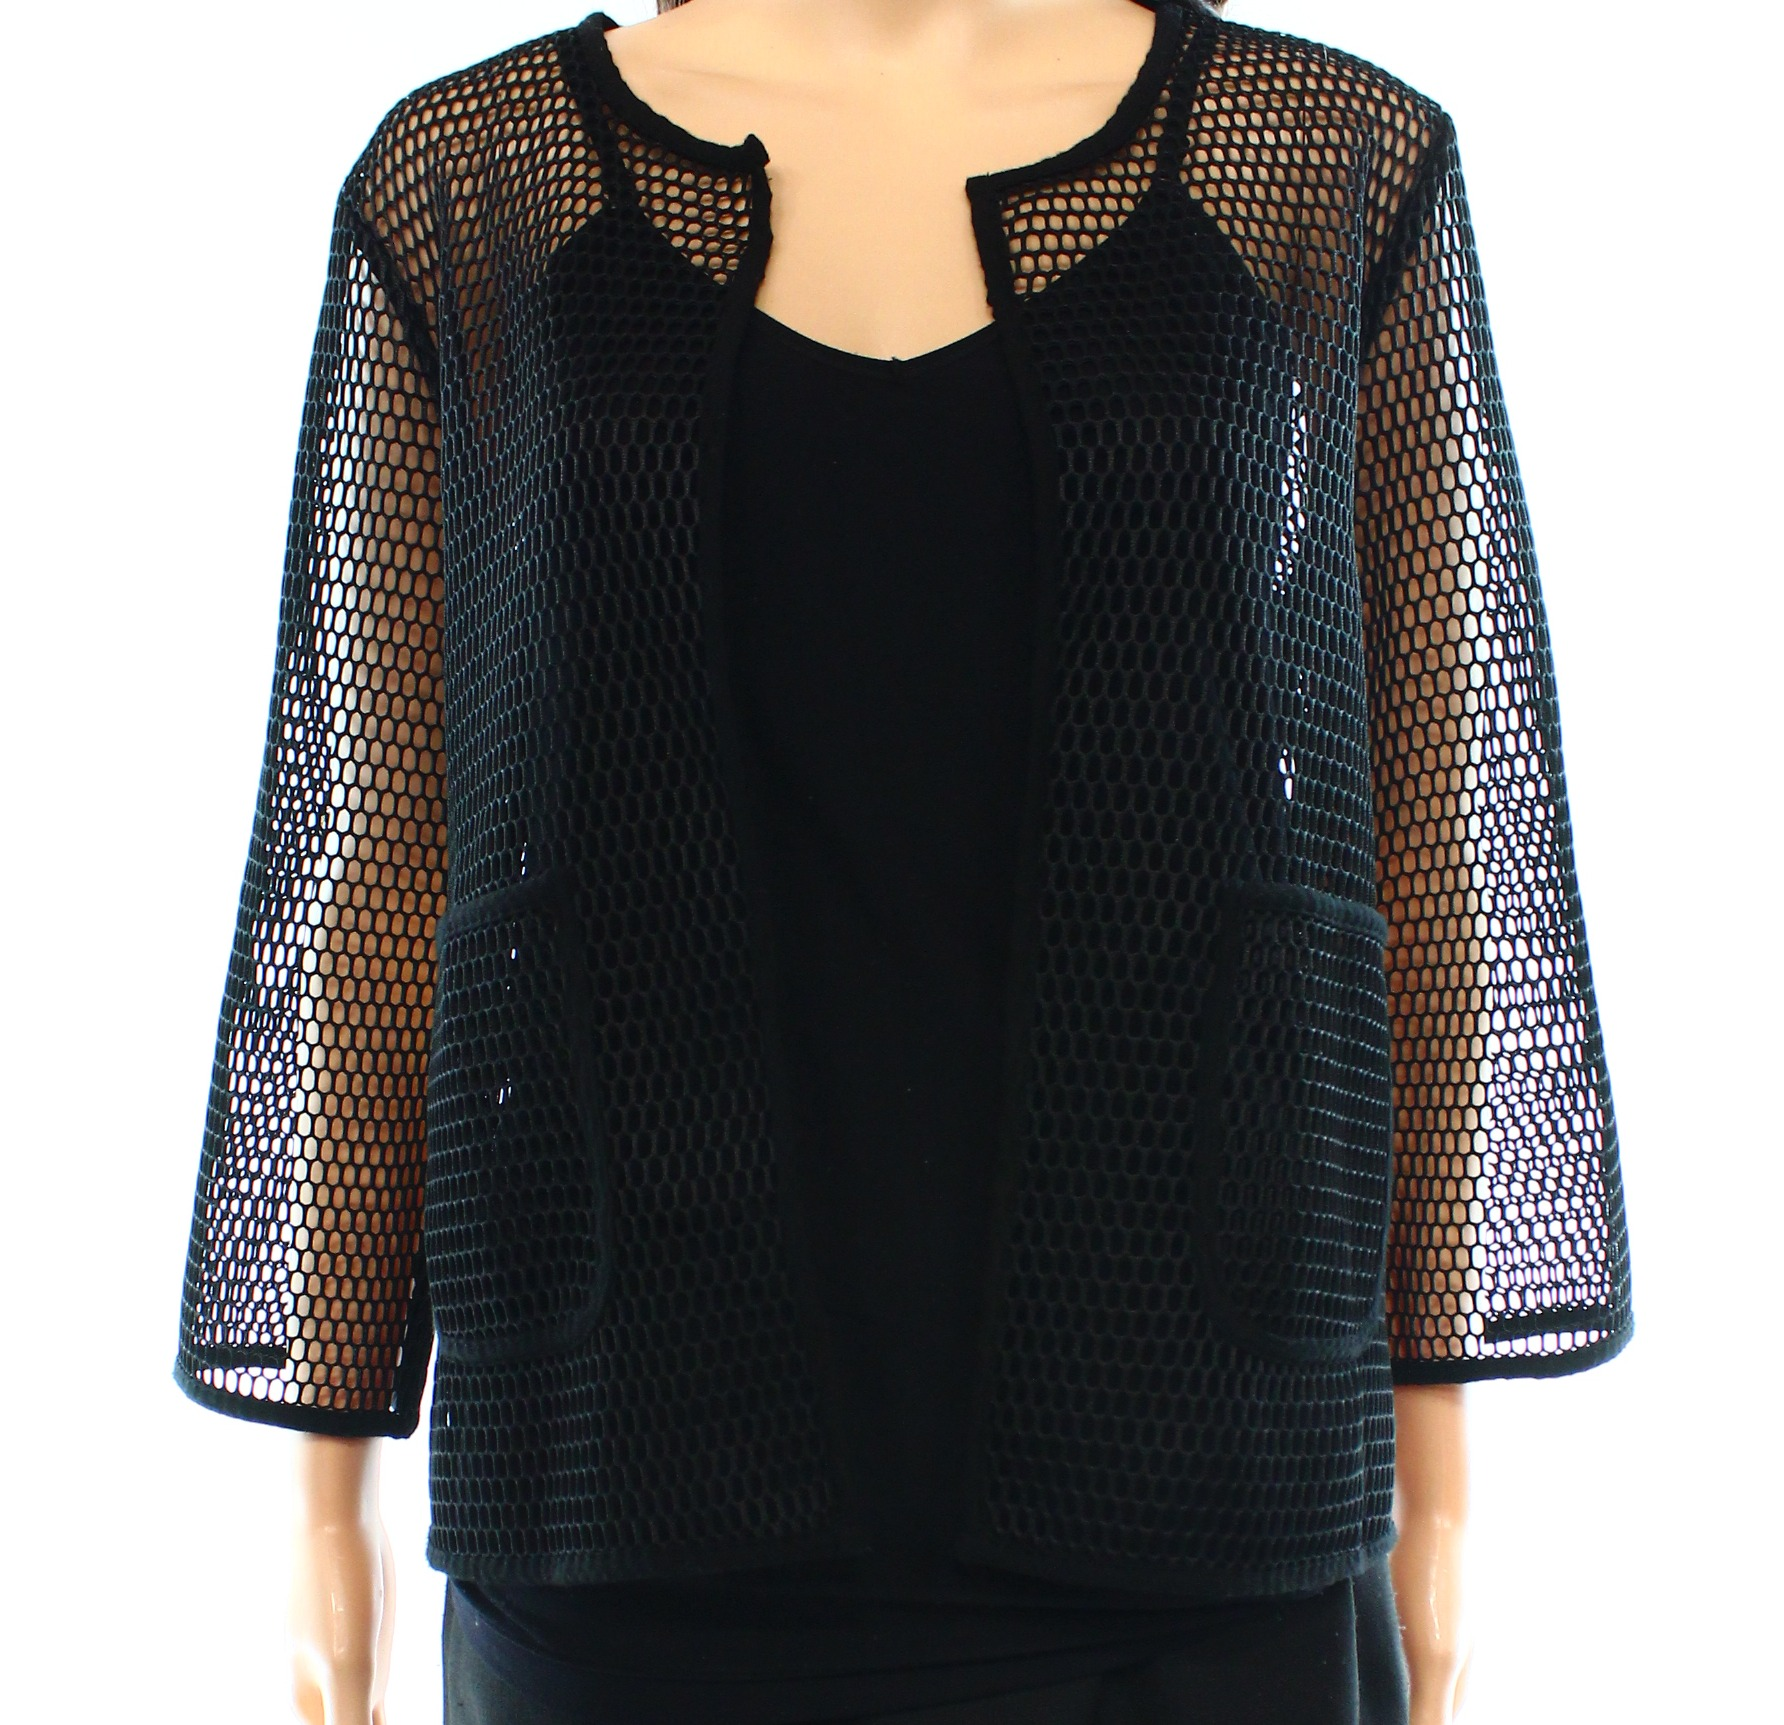 'Alfani NEW Black Women's Size Medium M Open-Front Mesh Solid Jacket